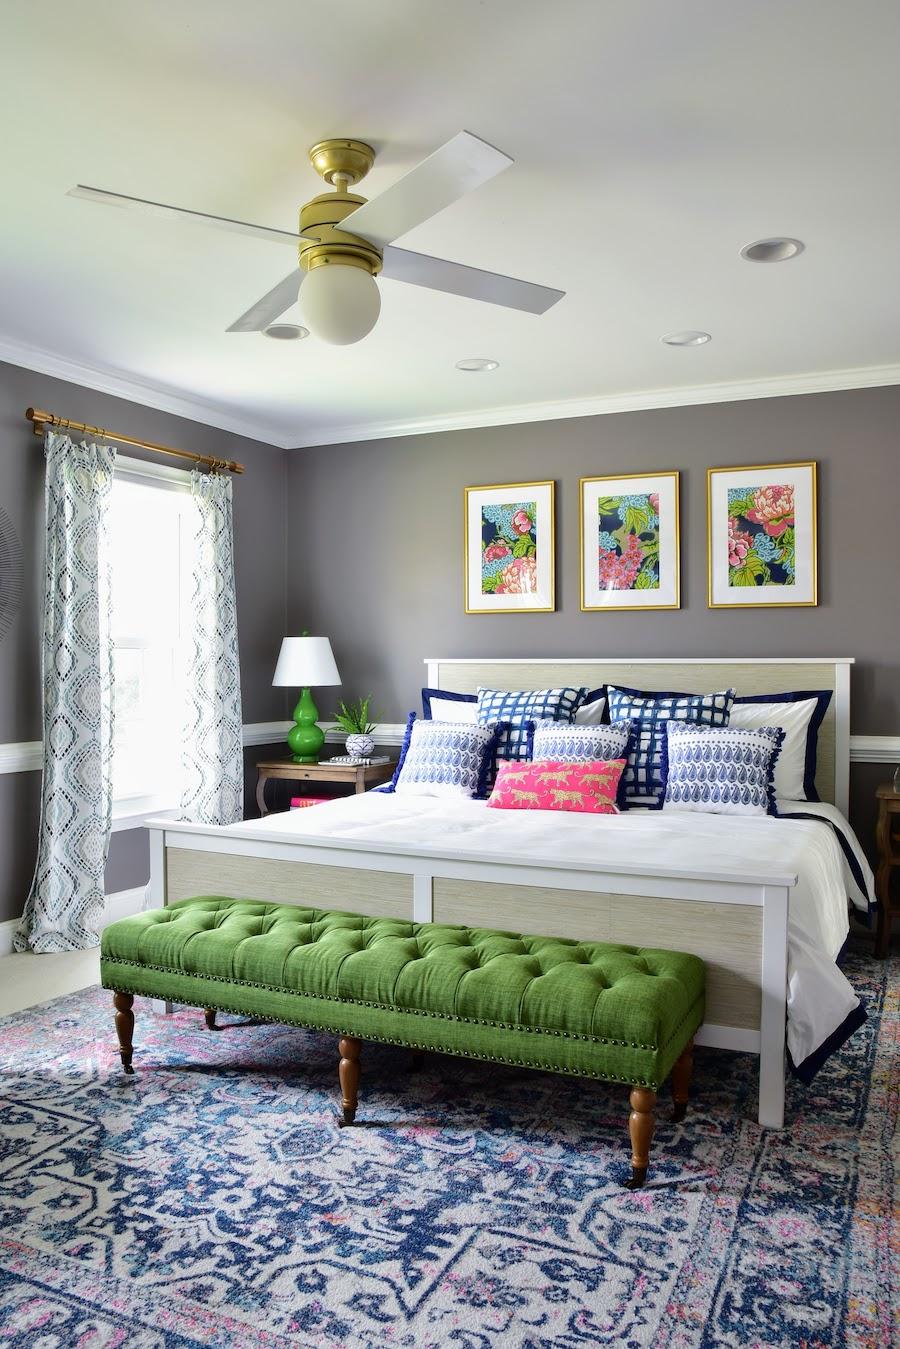 Side Angle of Main Bedroom